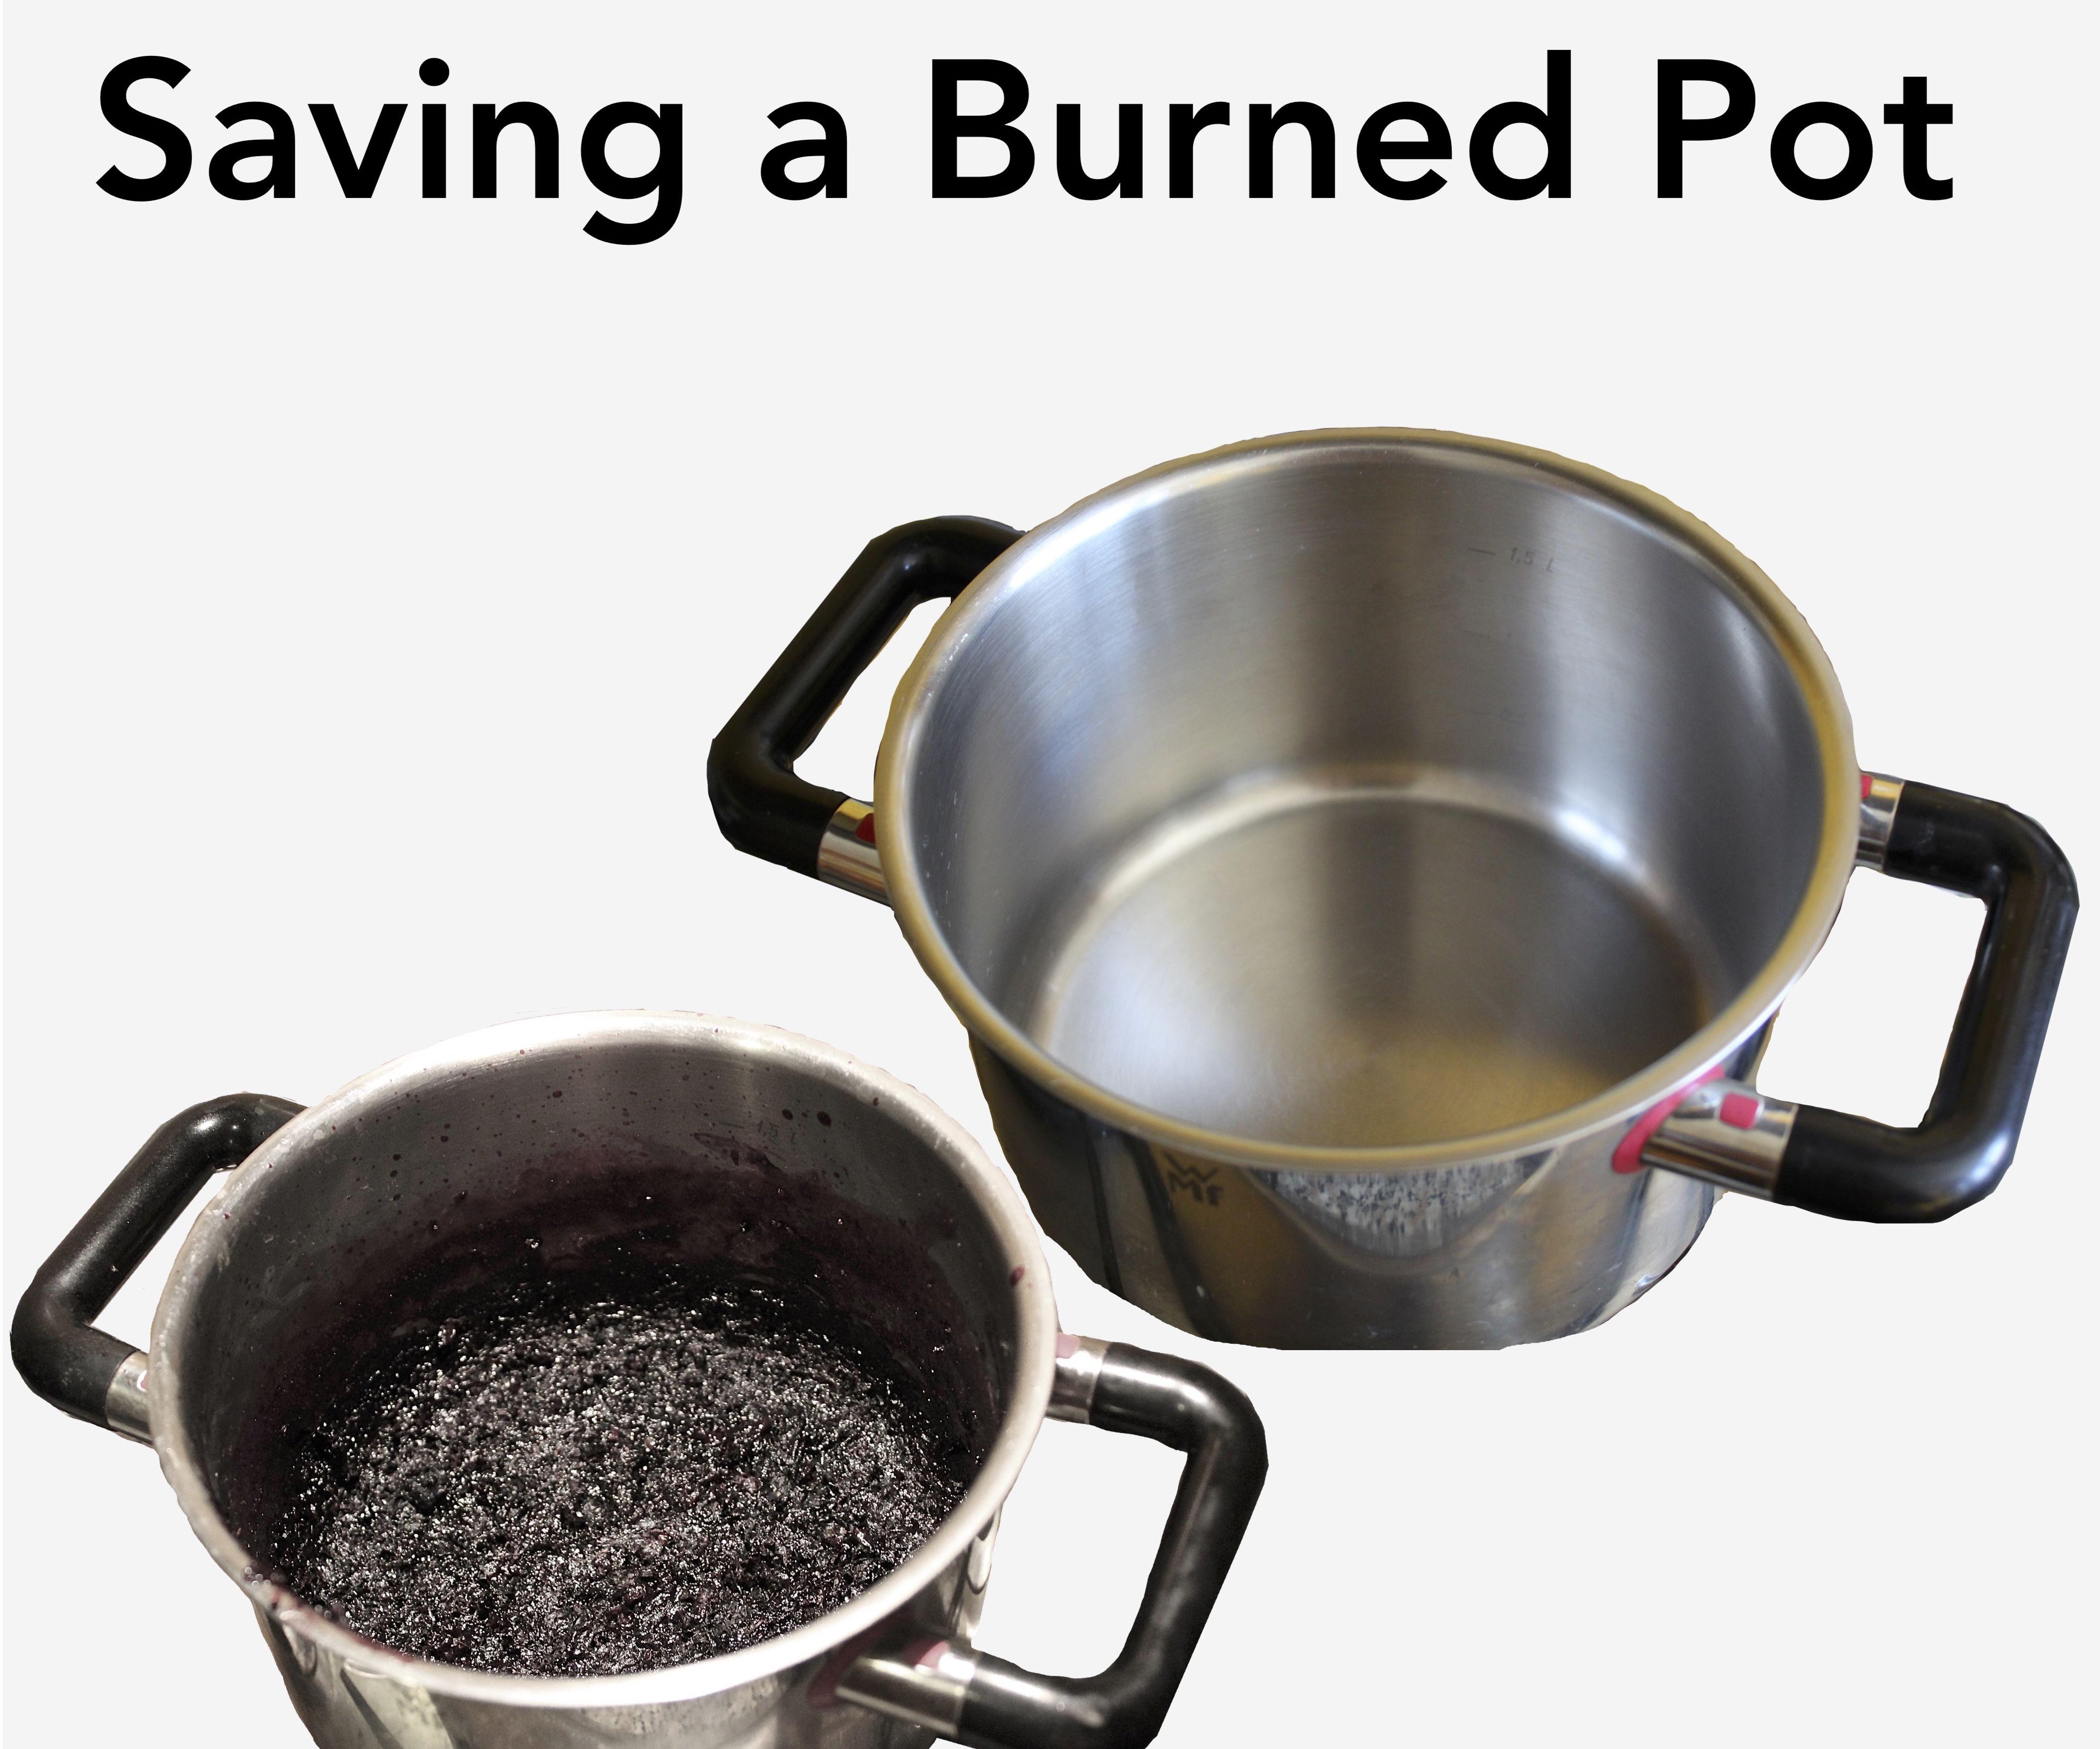 Save a Burned Pot